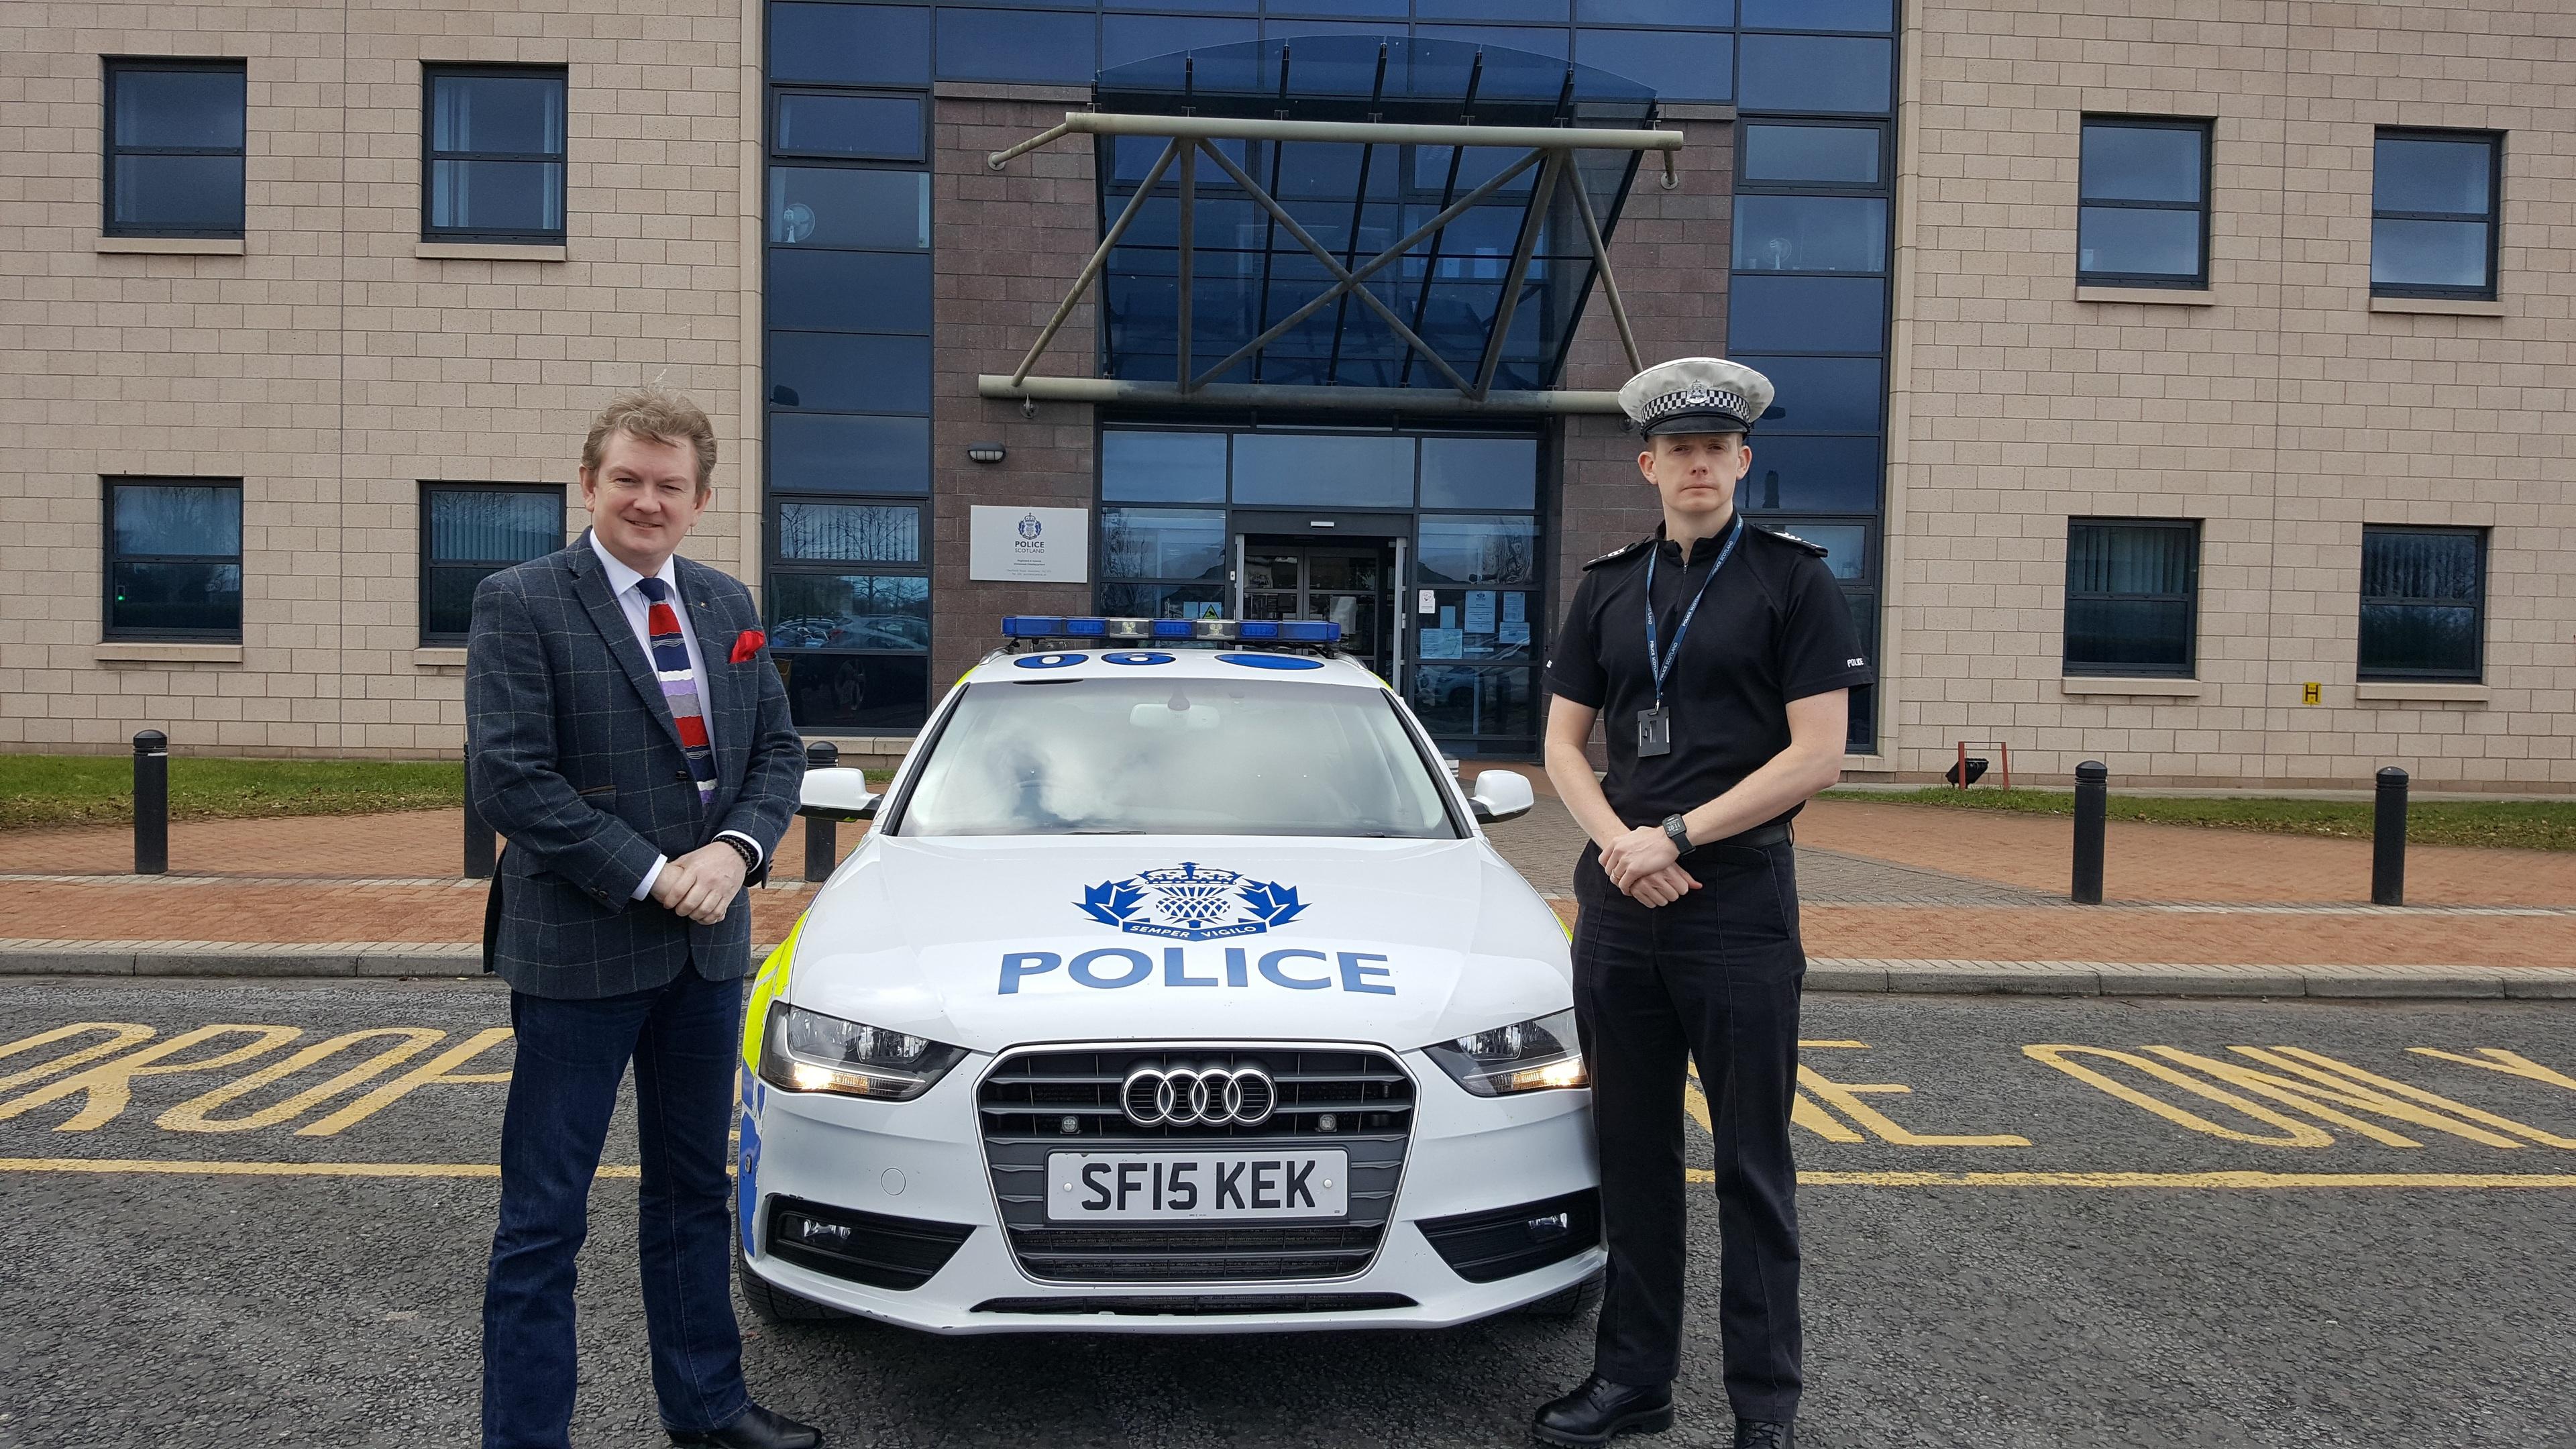 Sergeant Donnie Mackinnon and Jim Ferguson of Crimestoppers